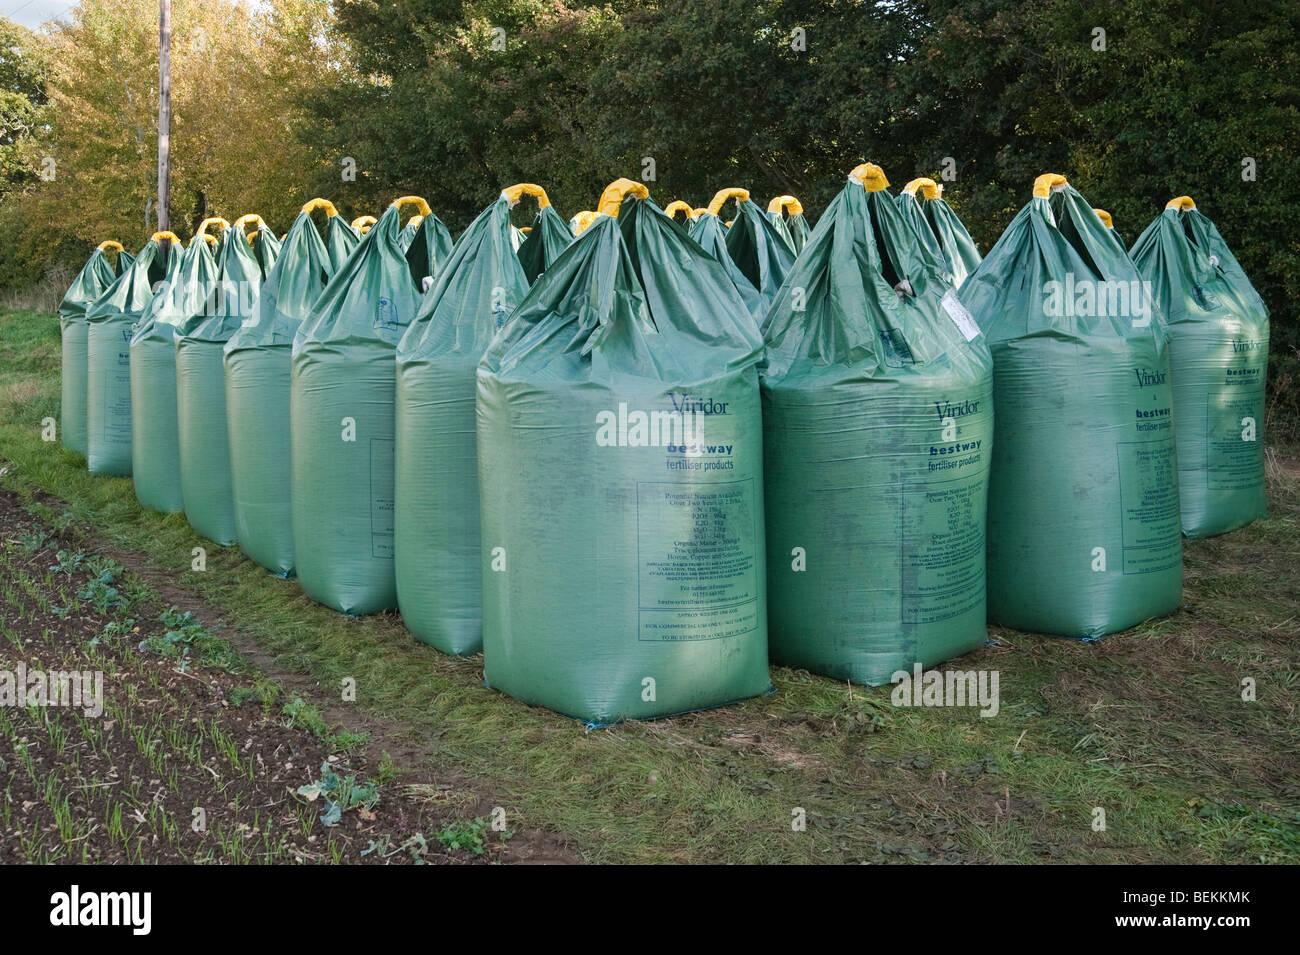 Inorganic Fertilizer Stock Photos & Inorganic Fertilizer